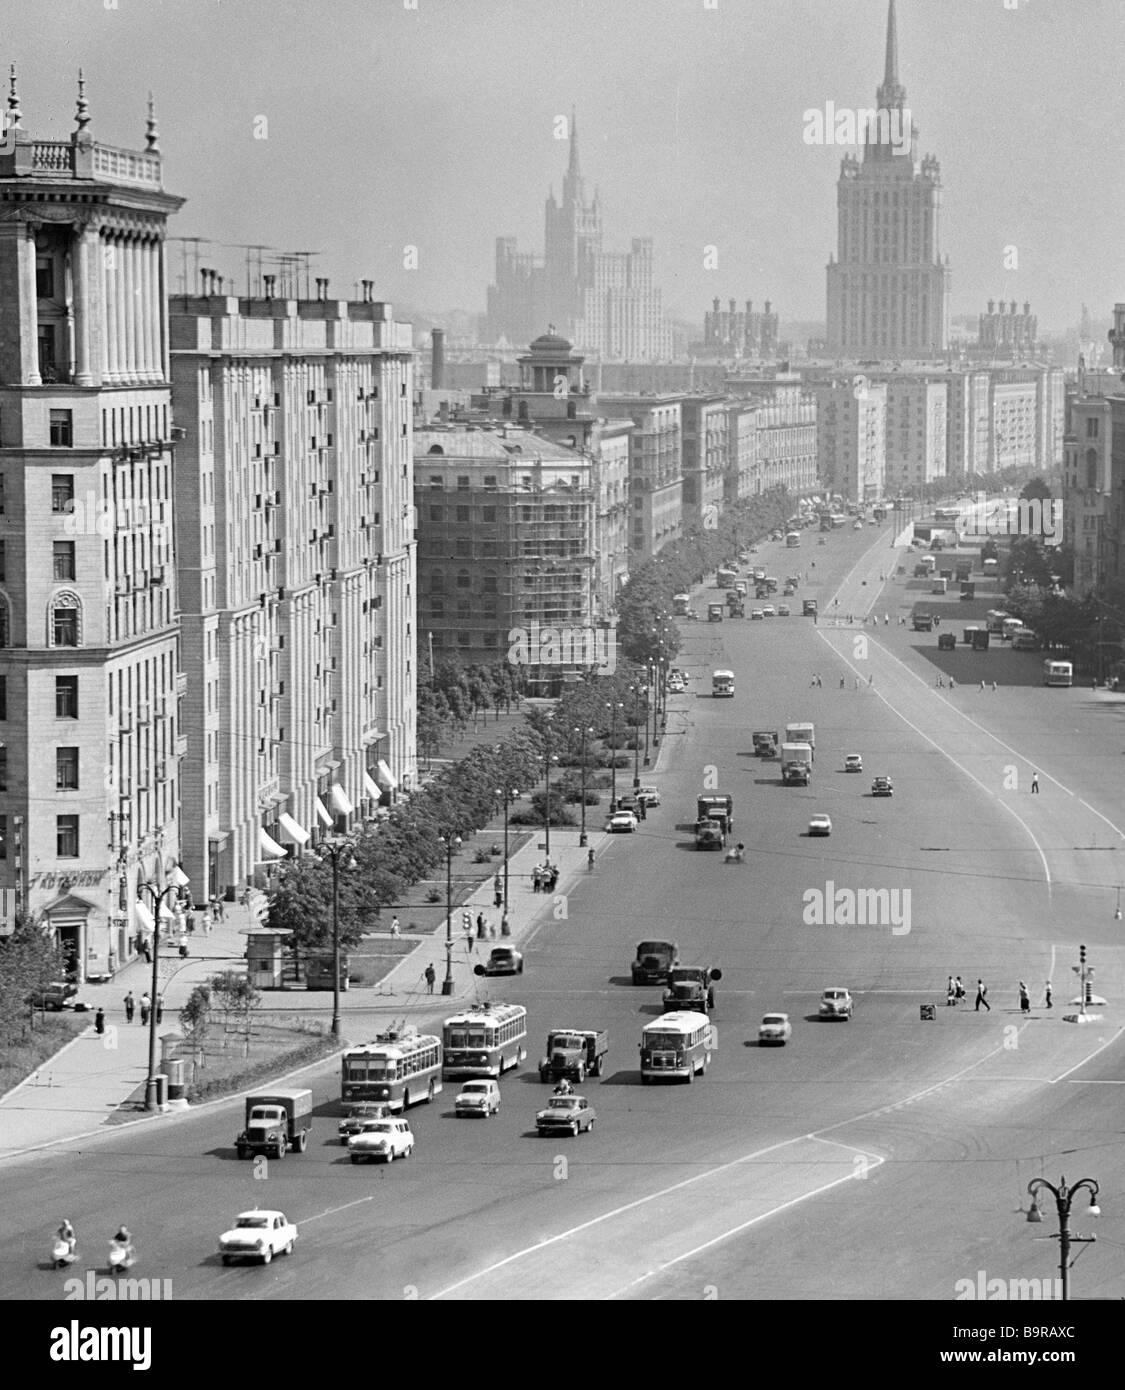 Kutuzov avenue in Moscow - Stock Image